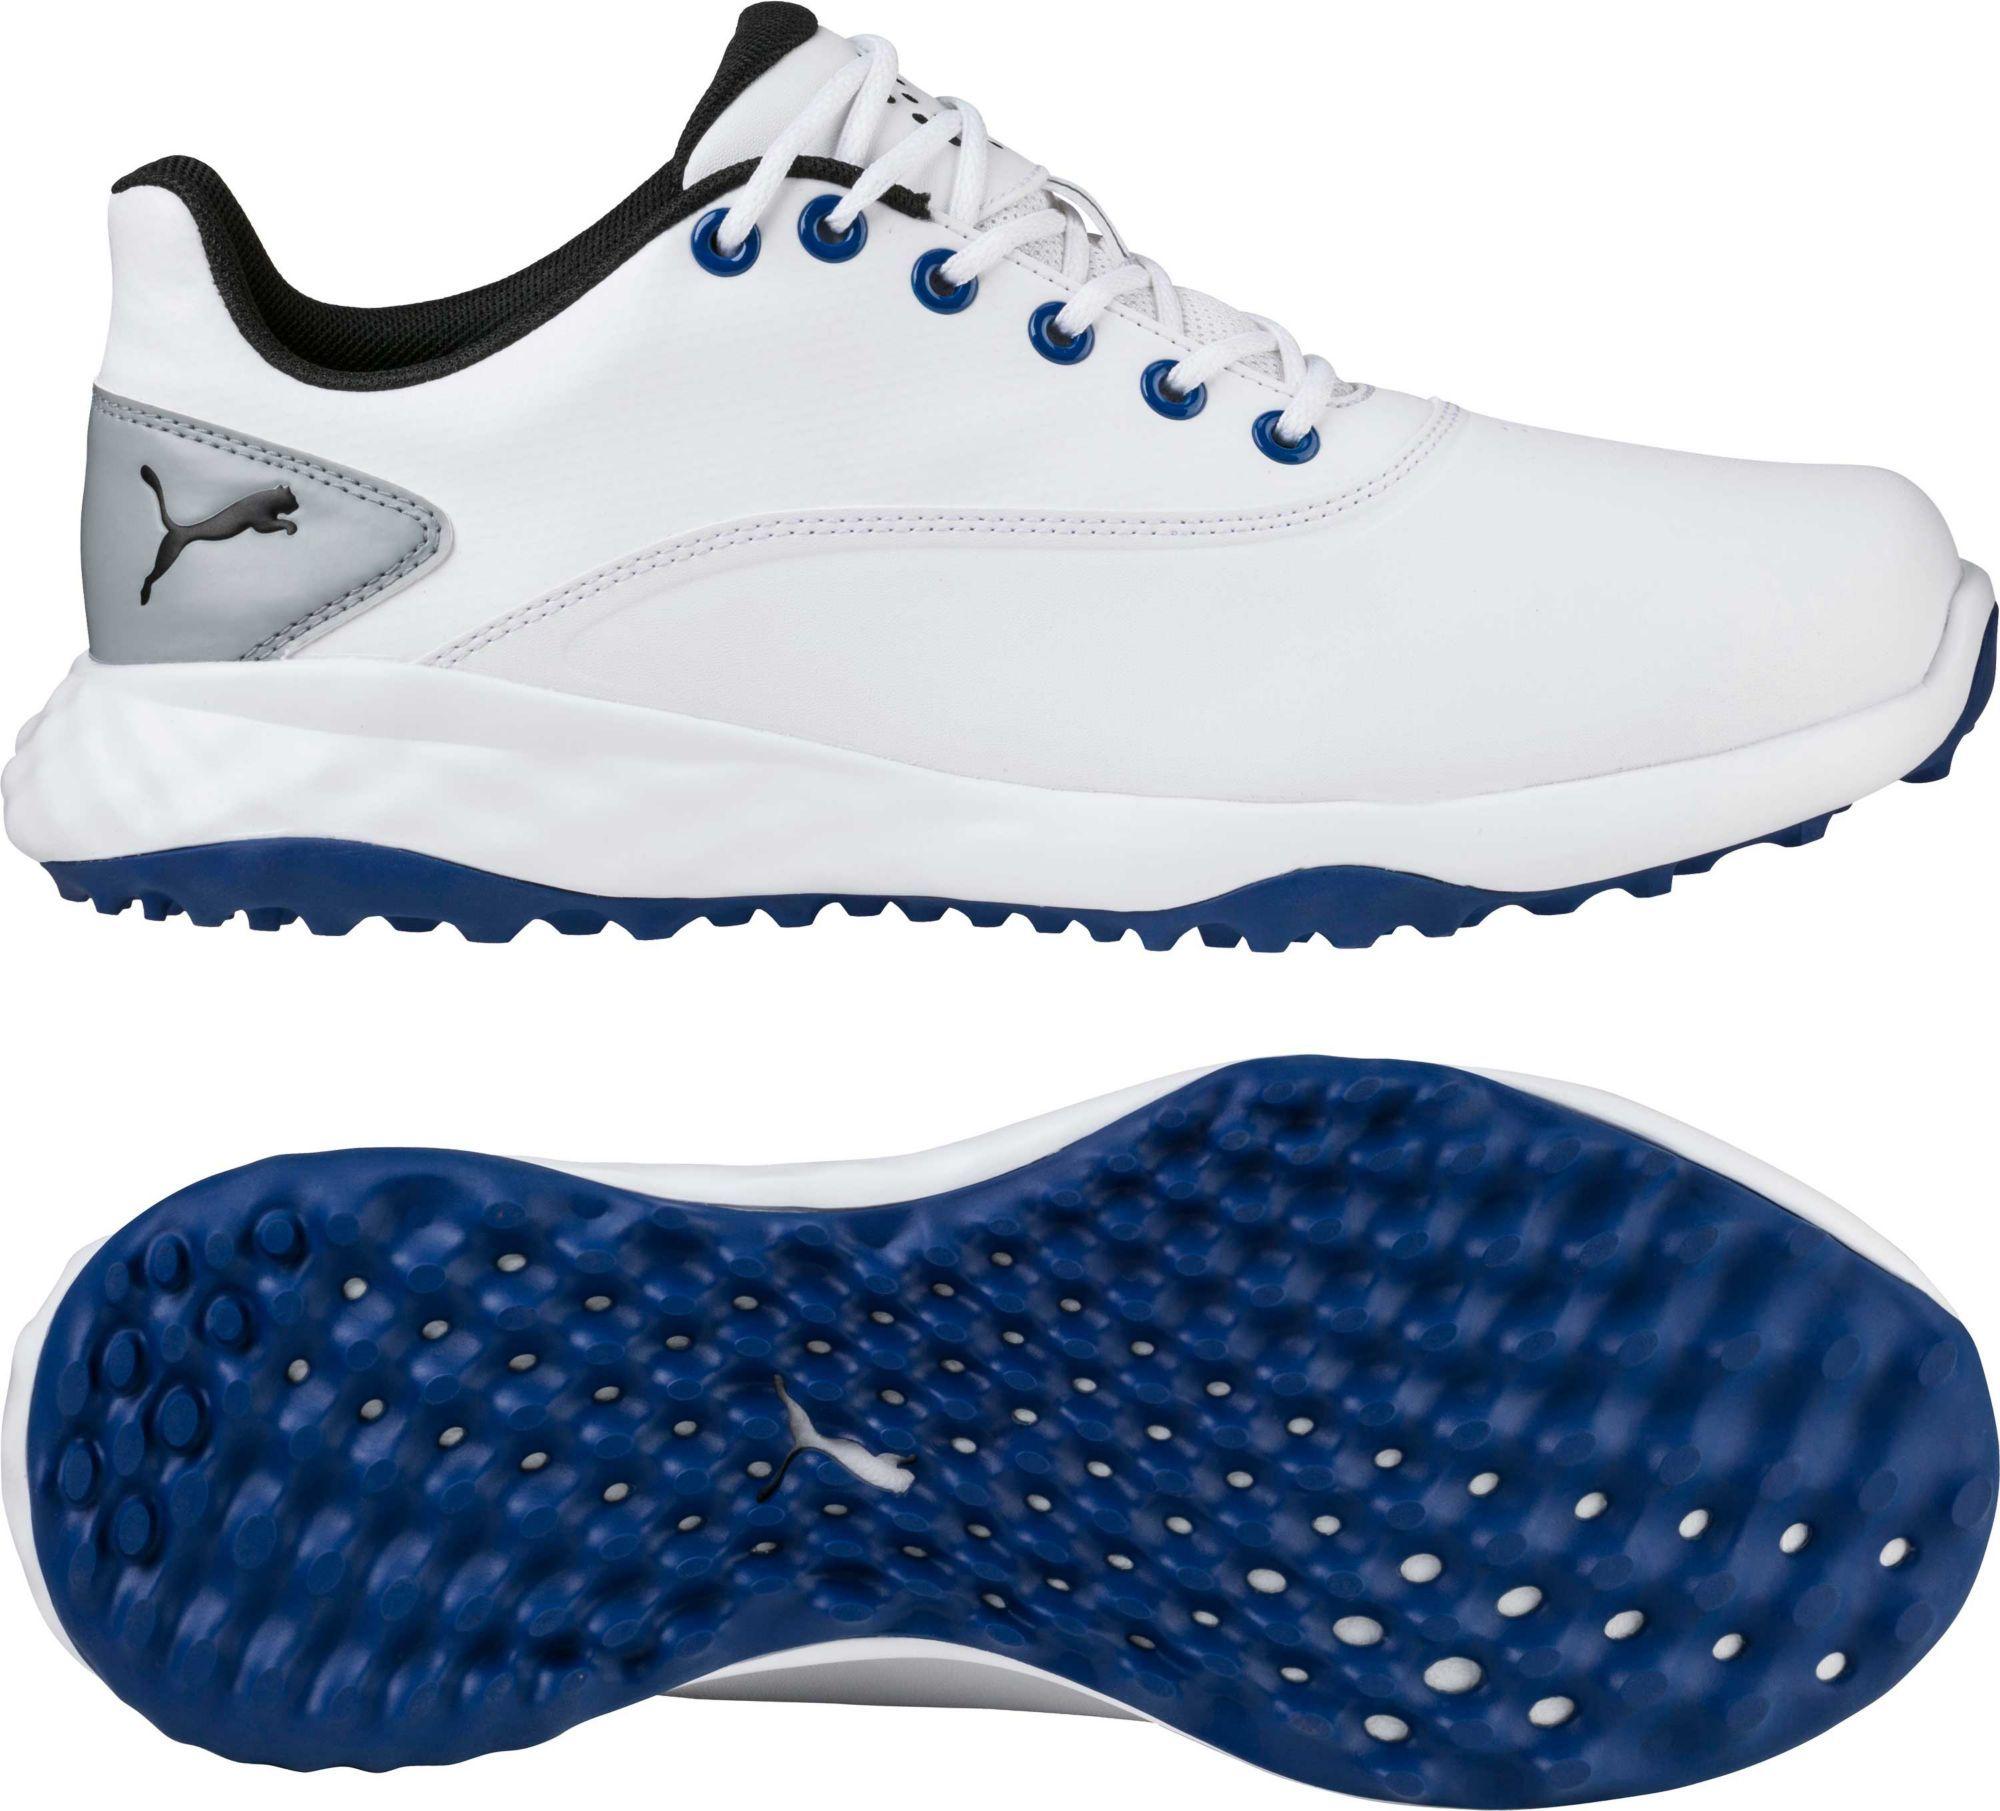 Puma Men s Grip Fusion Golf Shoes 3e0cf9fbb05